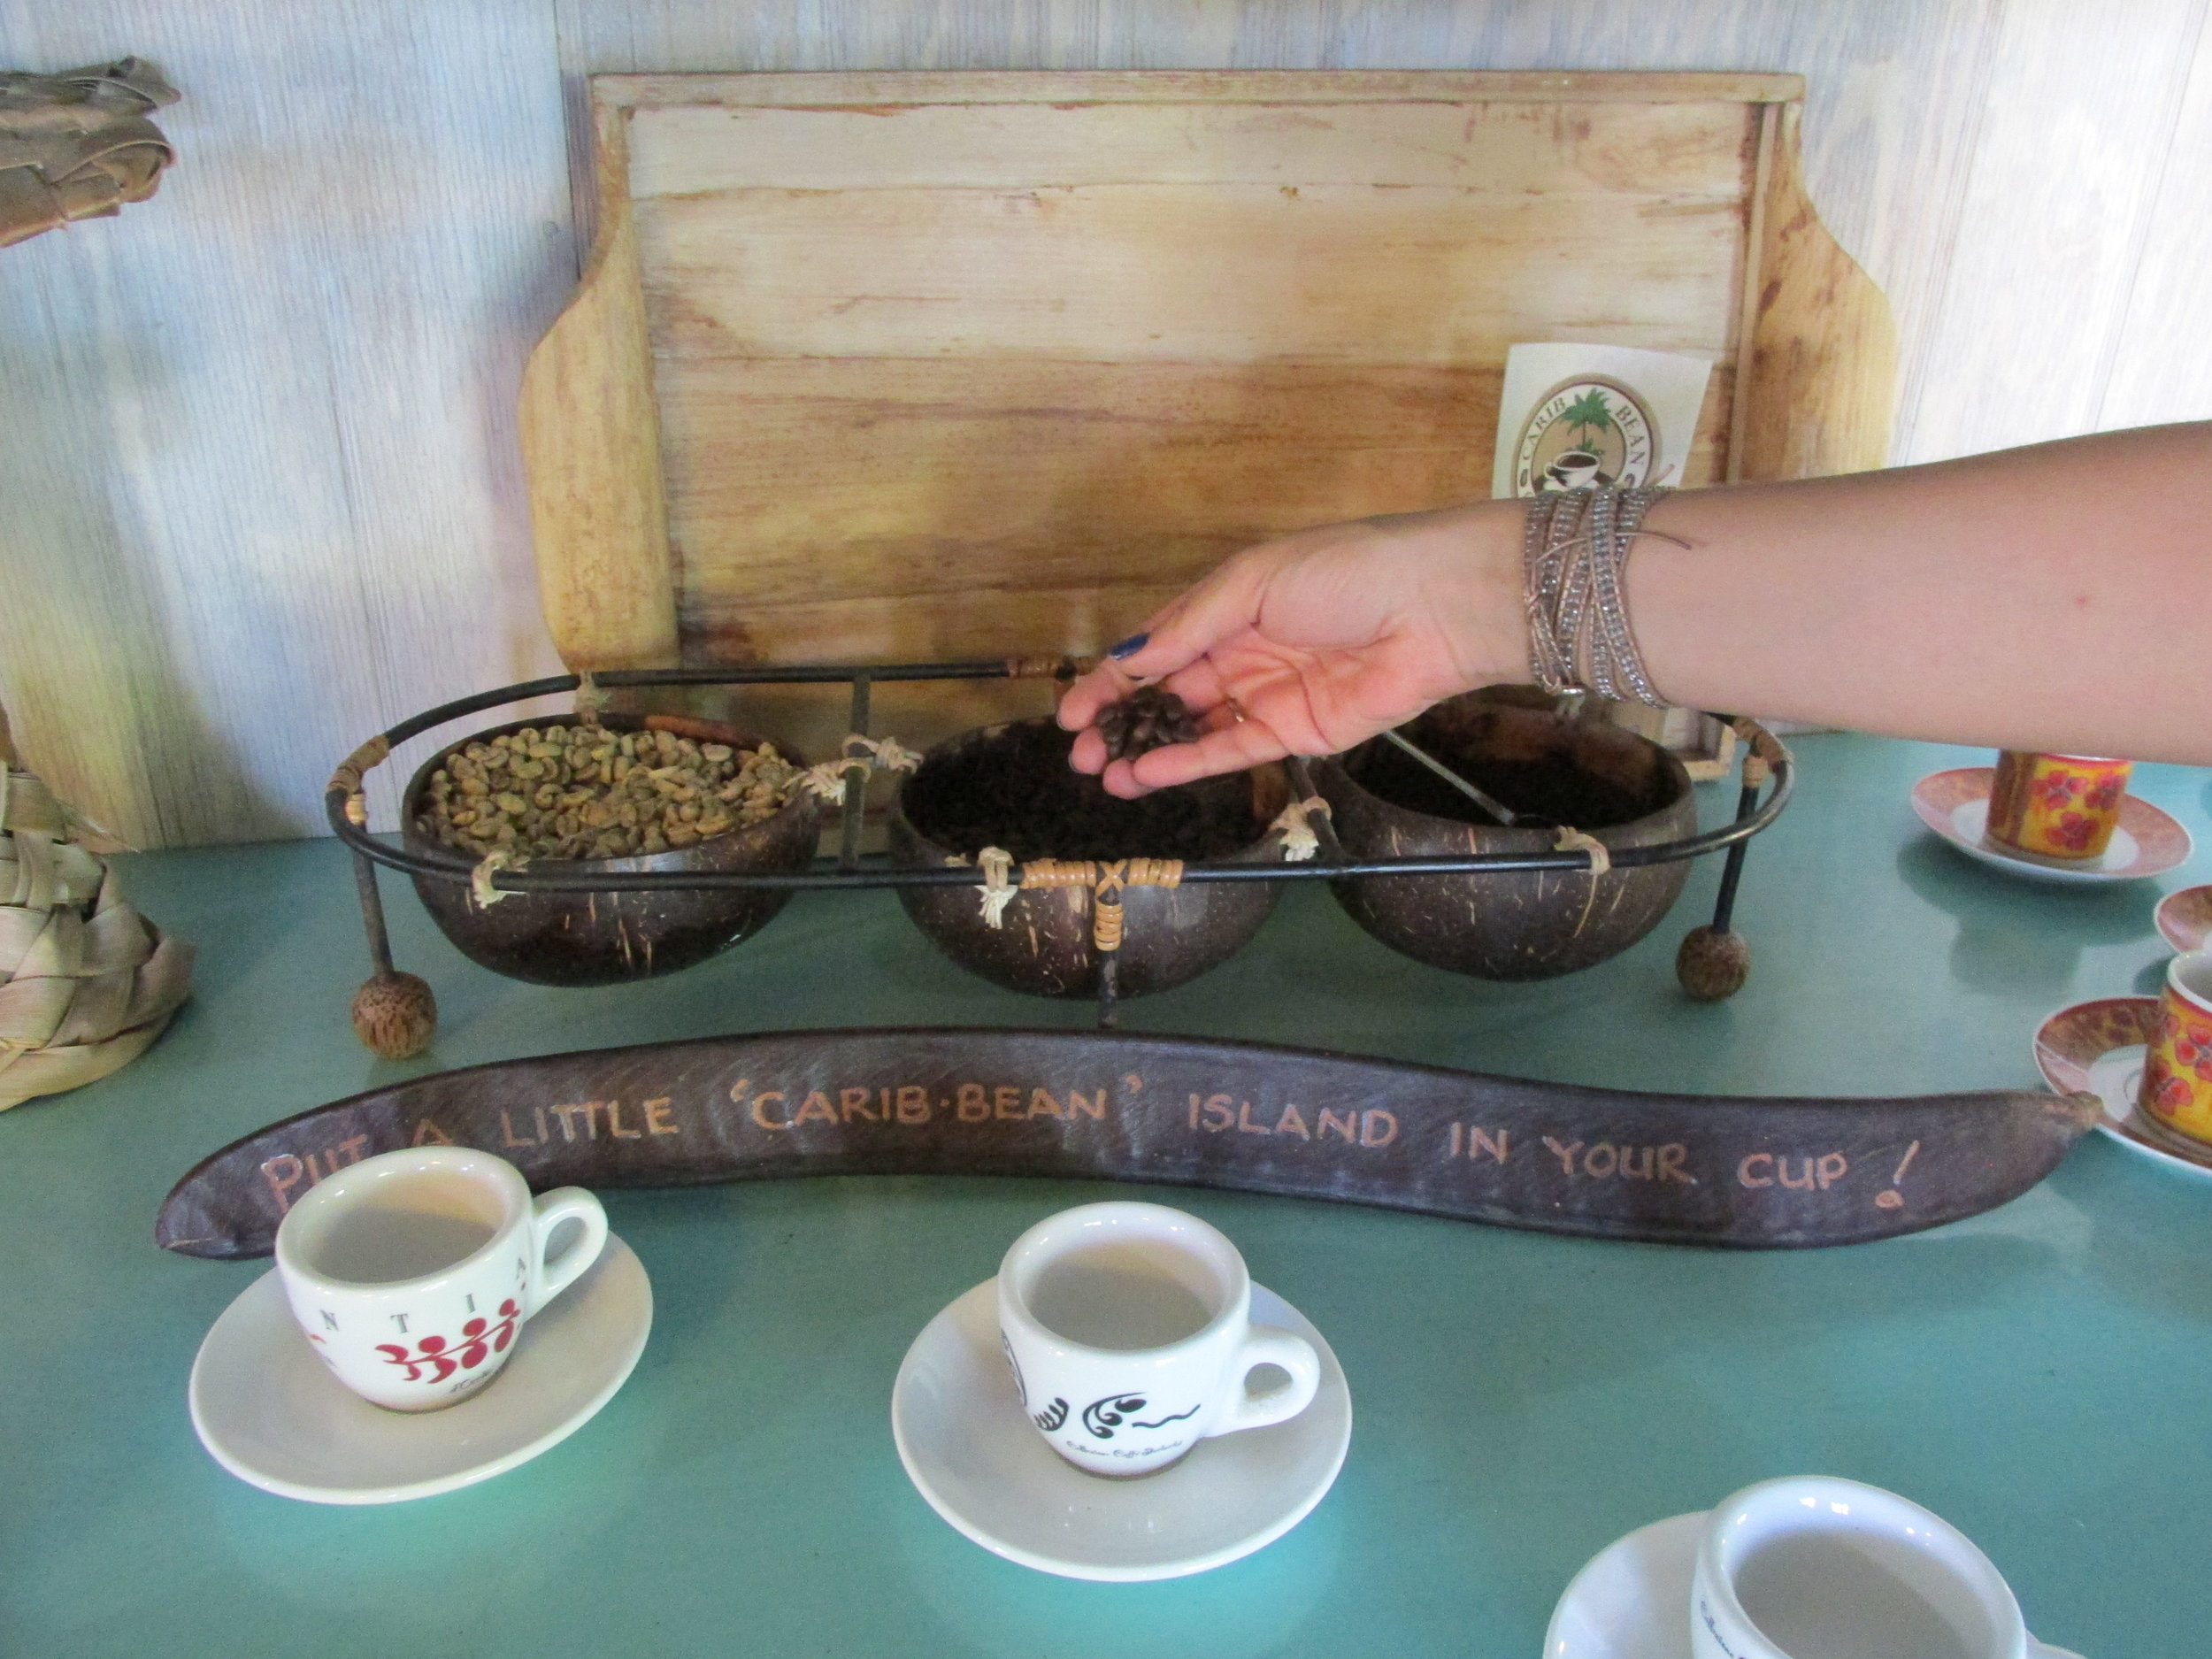 Carib Bean coffee roasters. Photo by Jennie Ritchie.